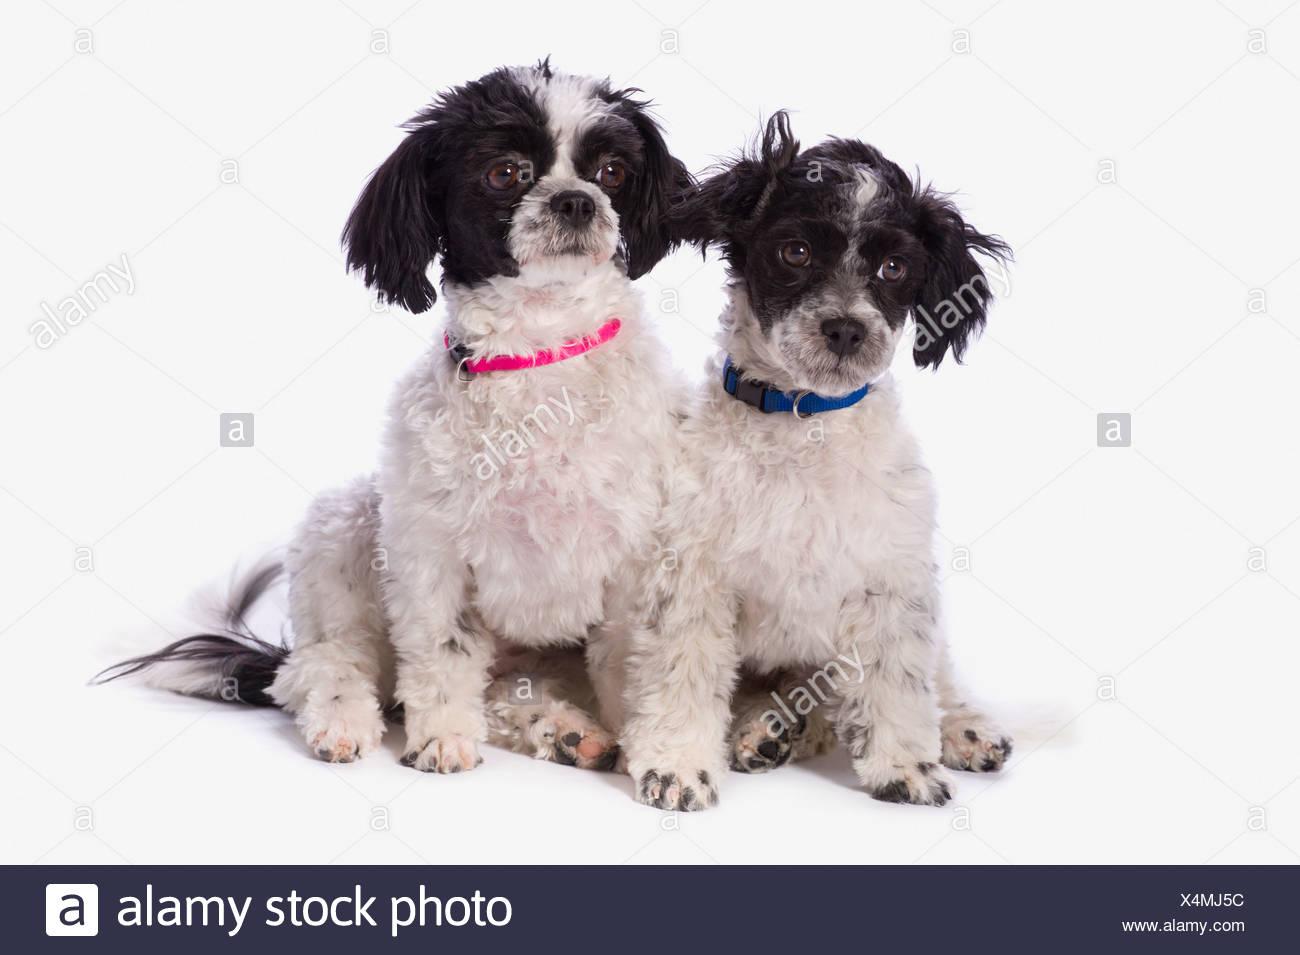 black and white havanese puppies